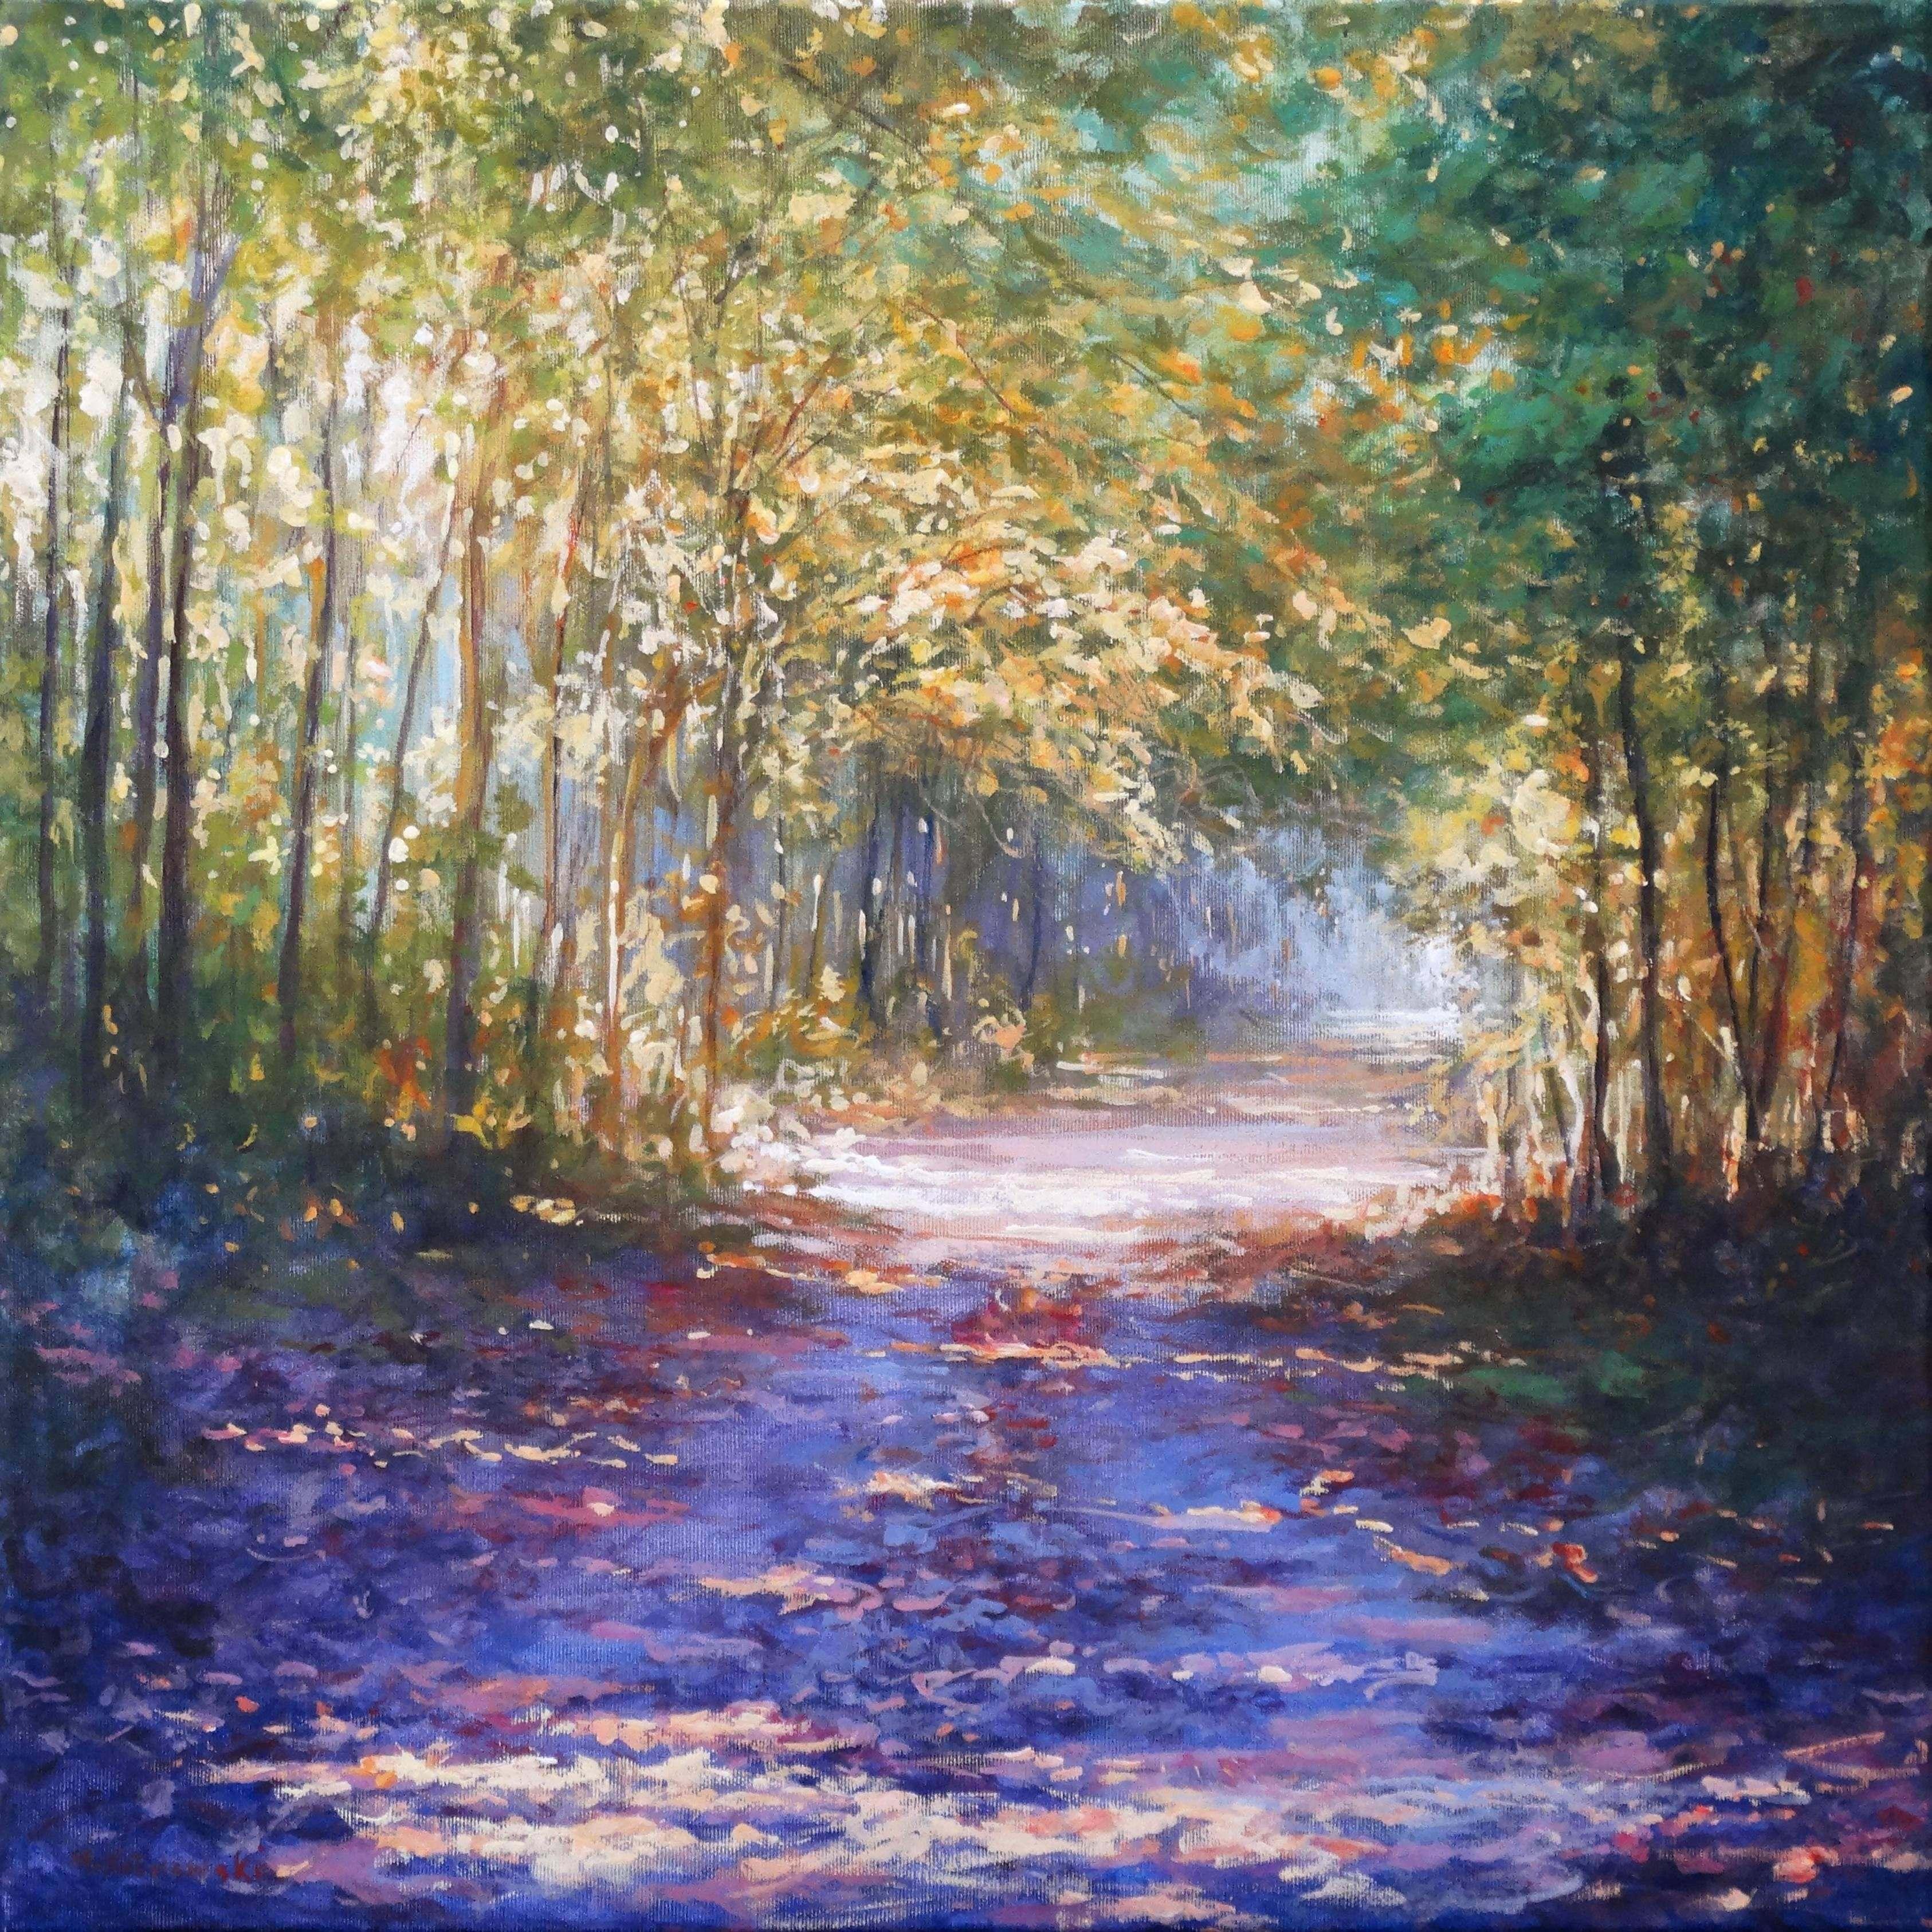 Mariusz Kaldowski, Enchanted Forest